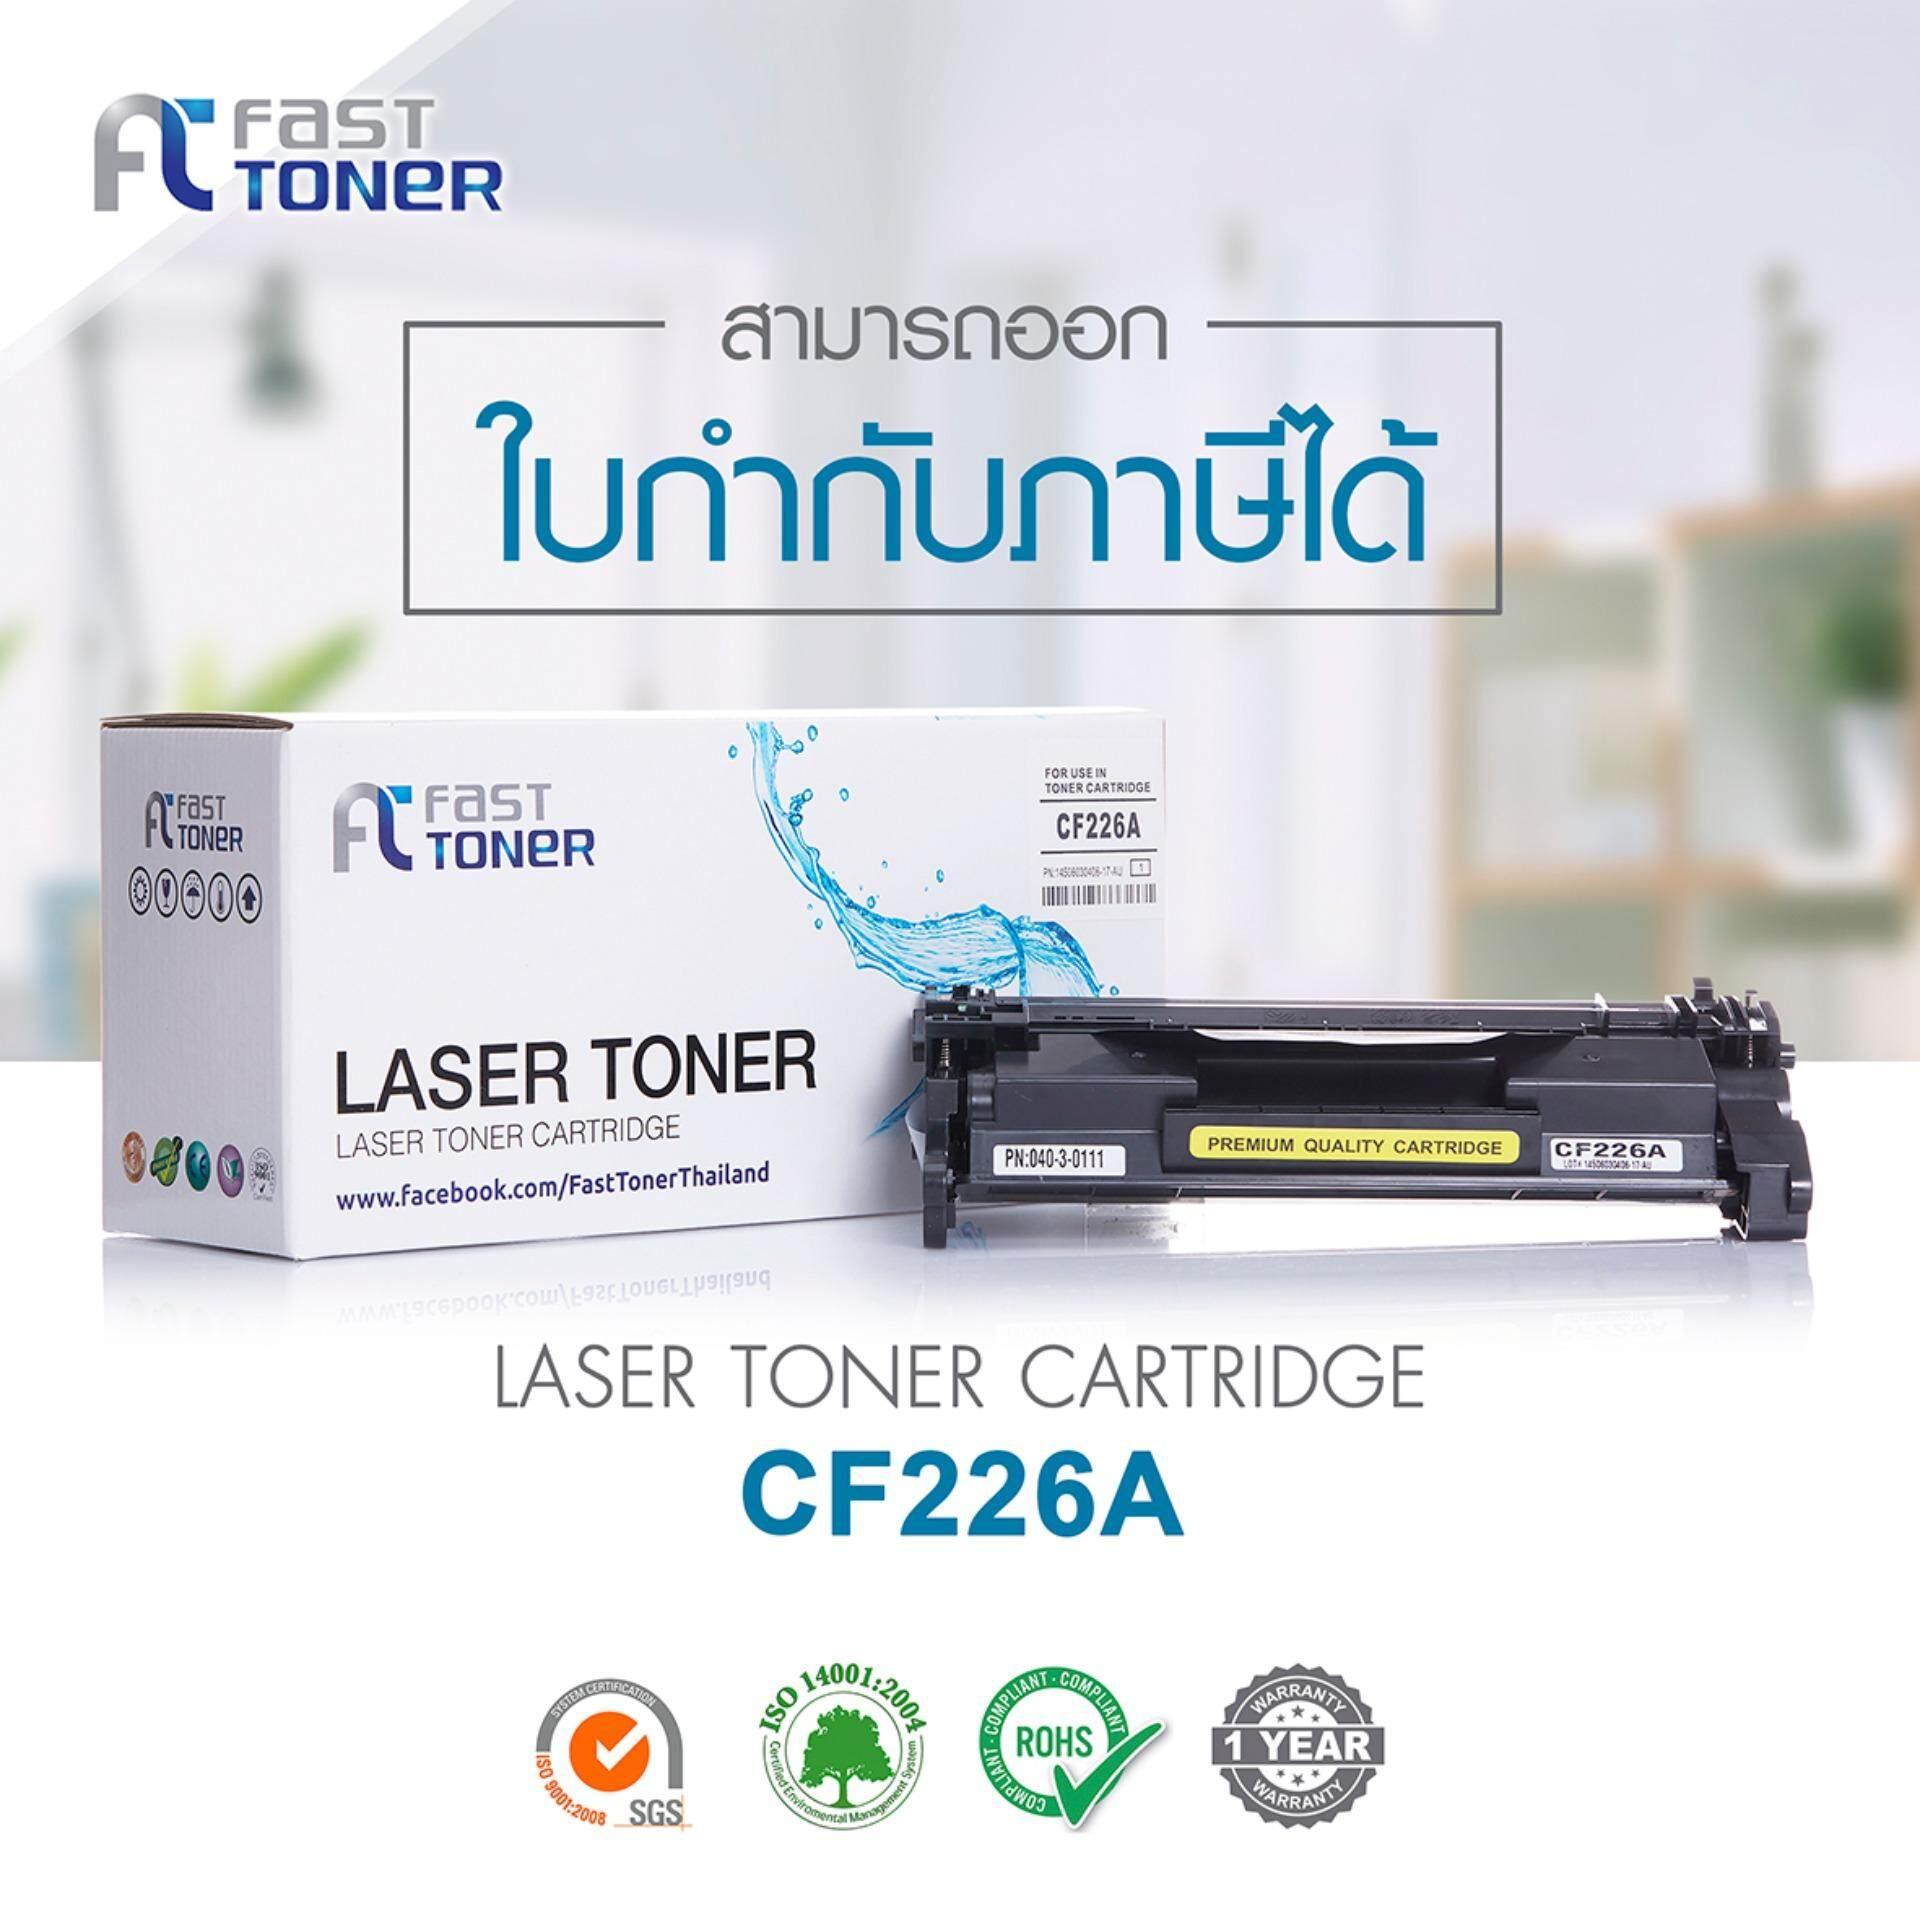 Fast Toner ตลับหมึกเทียบเท่าเลเซอร์ Laser Toner HP CF226A (26A) สำหรับเครื่องพิมพ์รุ่นHP LaserJet M402d